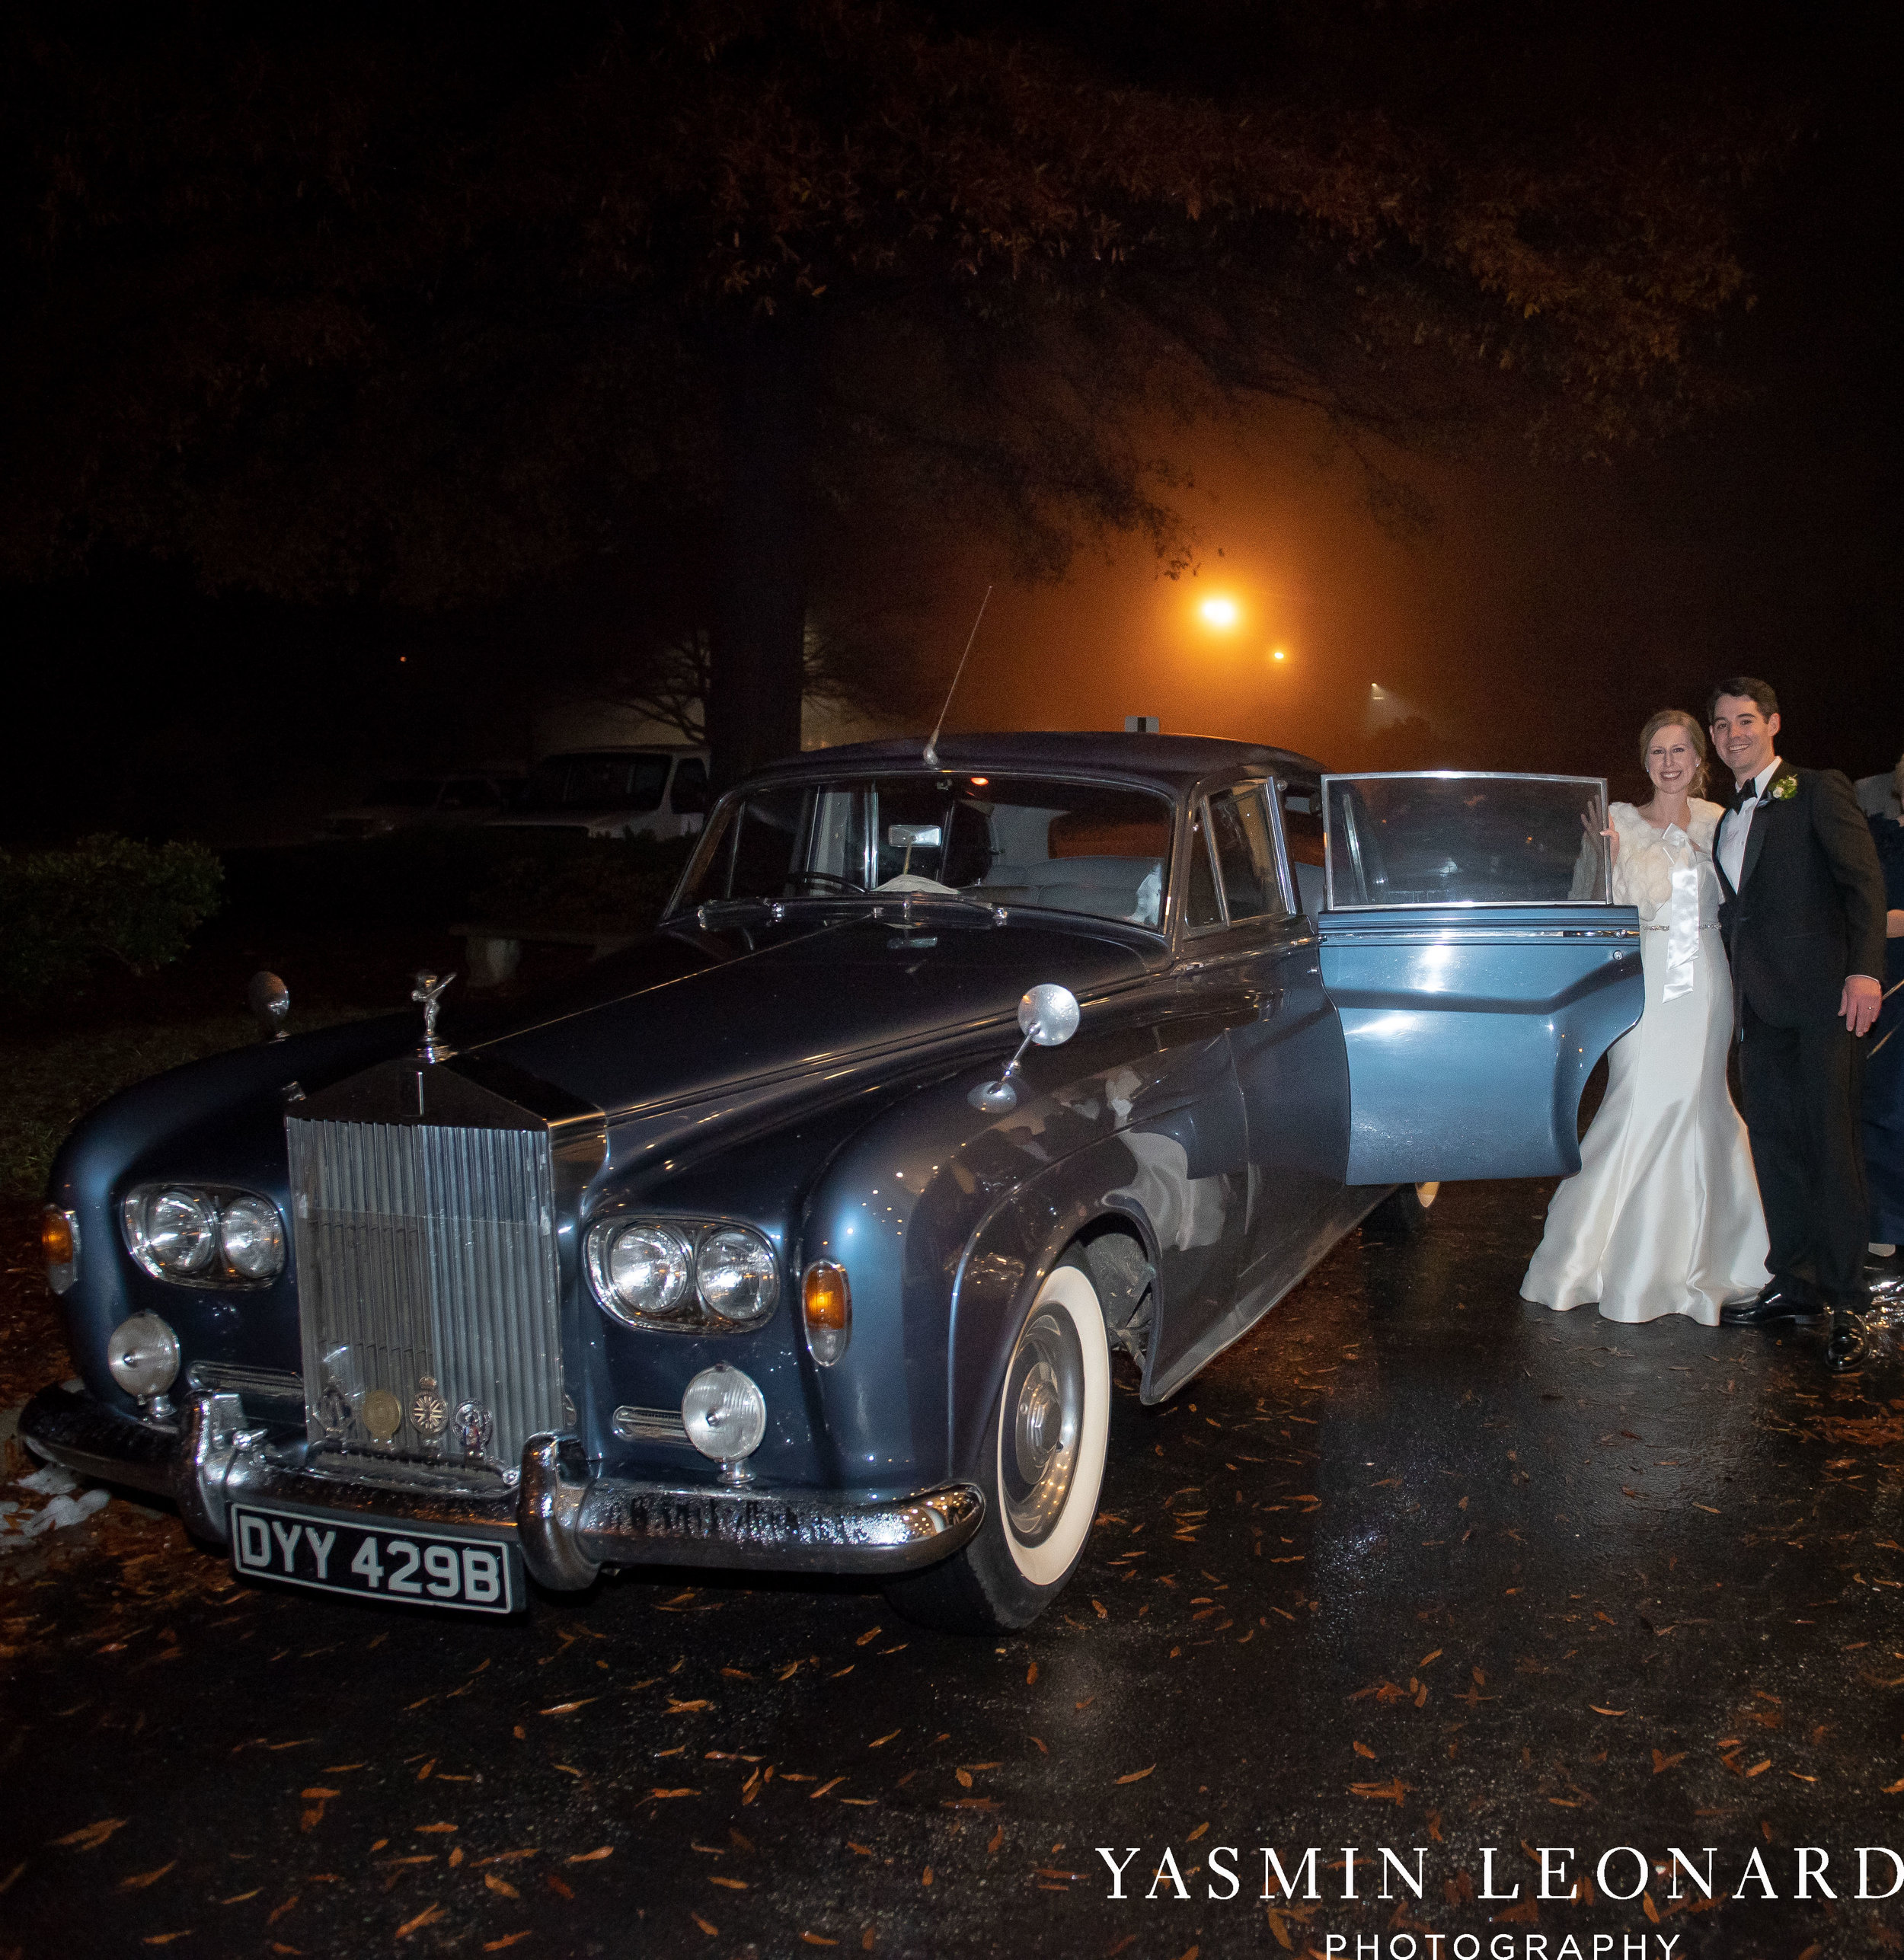 Wesley Memorial UMC - High Point Country Club - Emerywood Country Club - High Point Weddings - High Point Wedding Photographer - Yasmin Leonard Photography-52.jpg